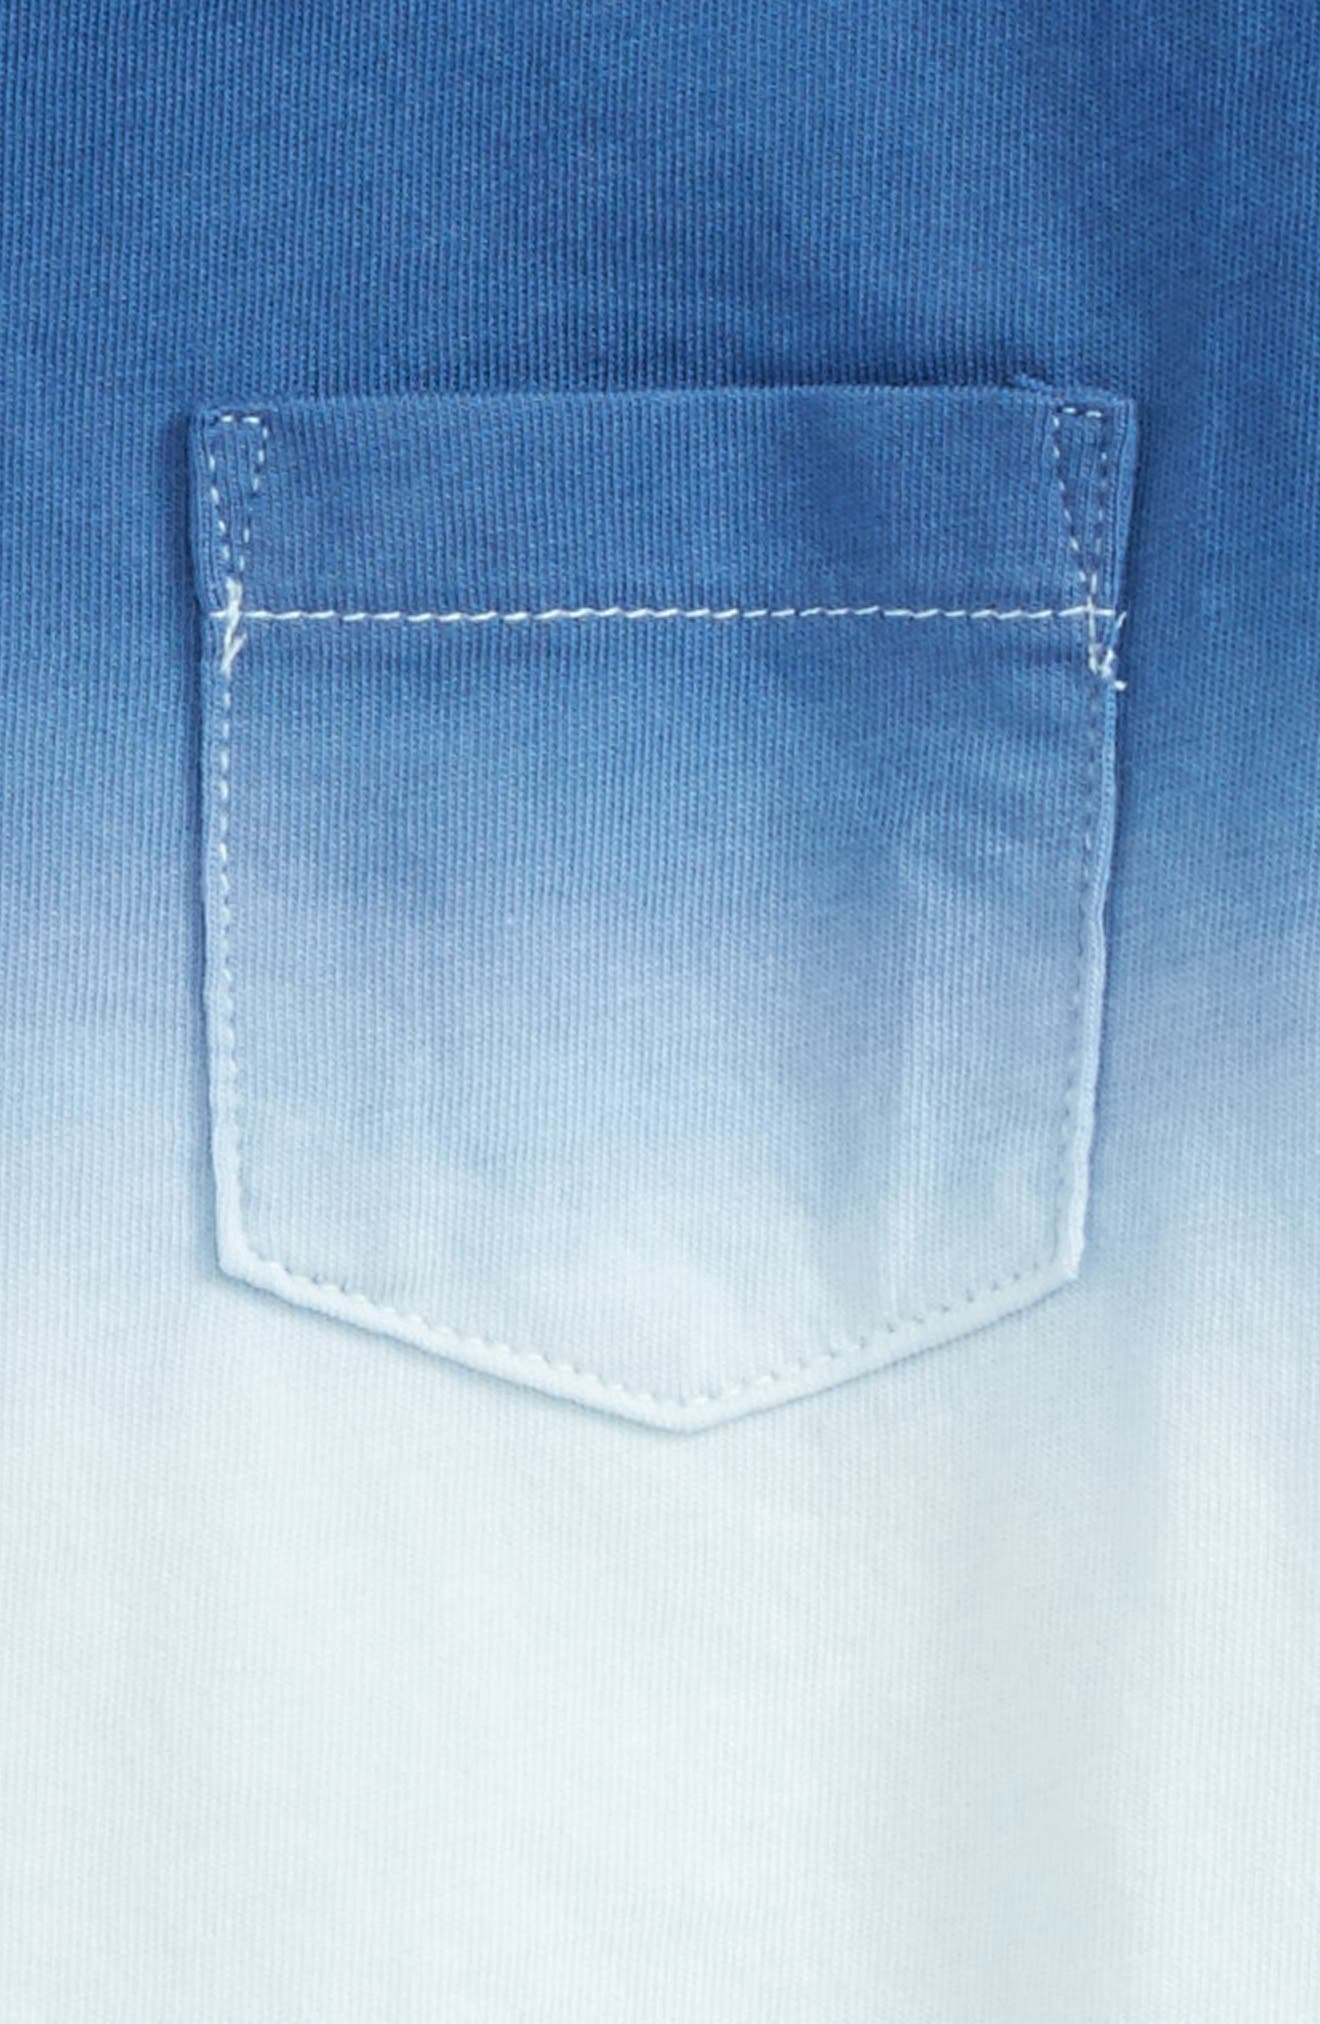 Peek Dip Dye Pocket T-Shirt,                             Alternate thumbnail 2, color,                             452